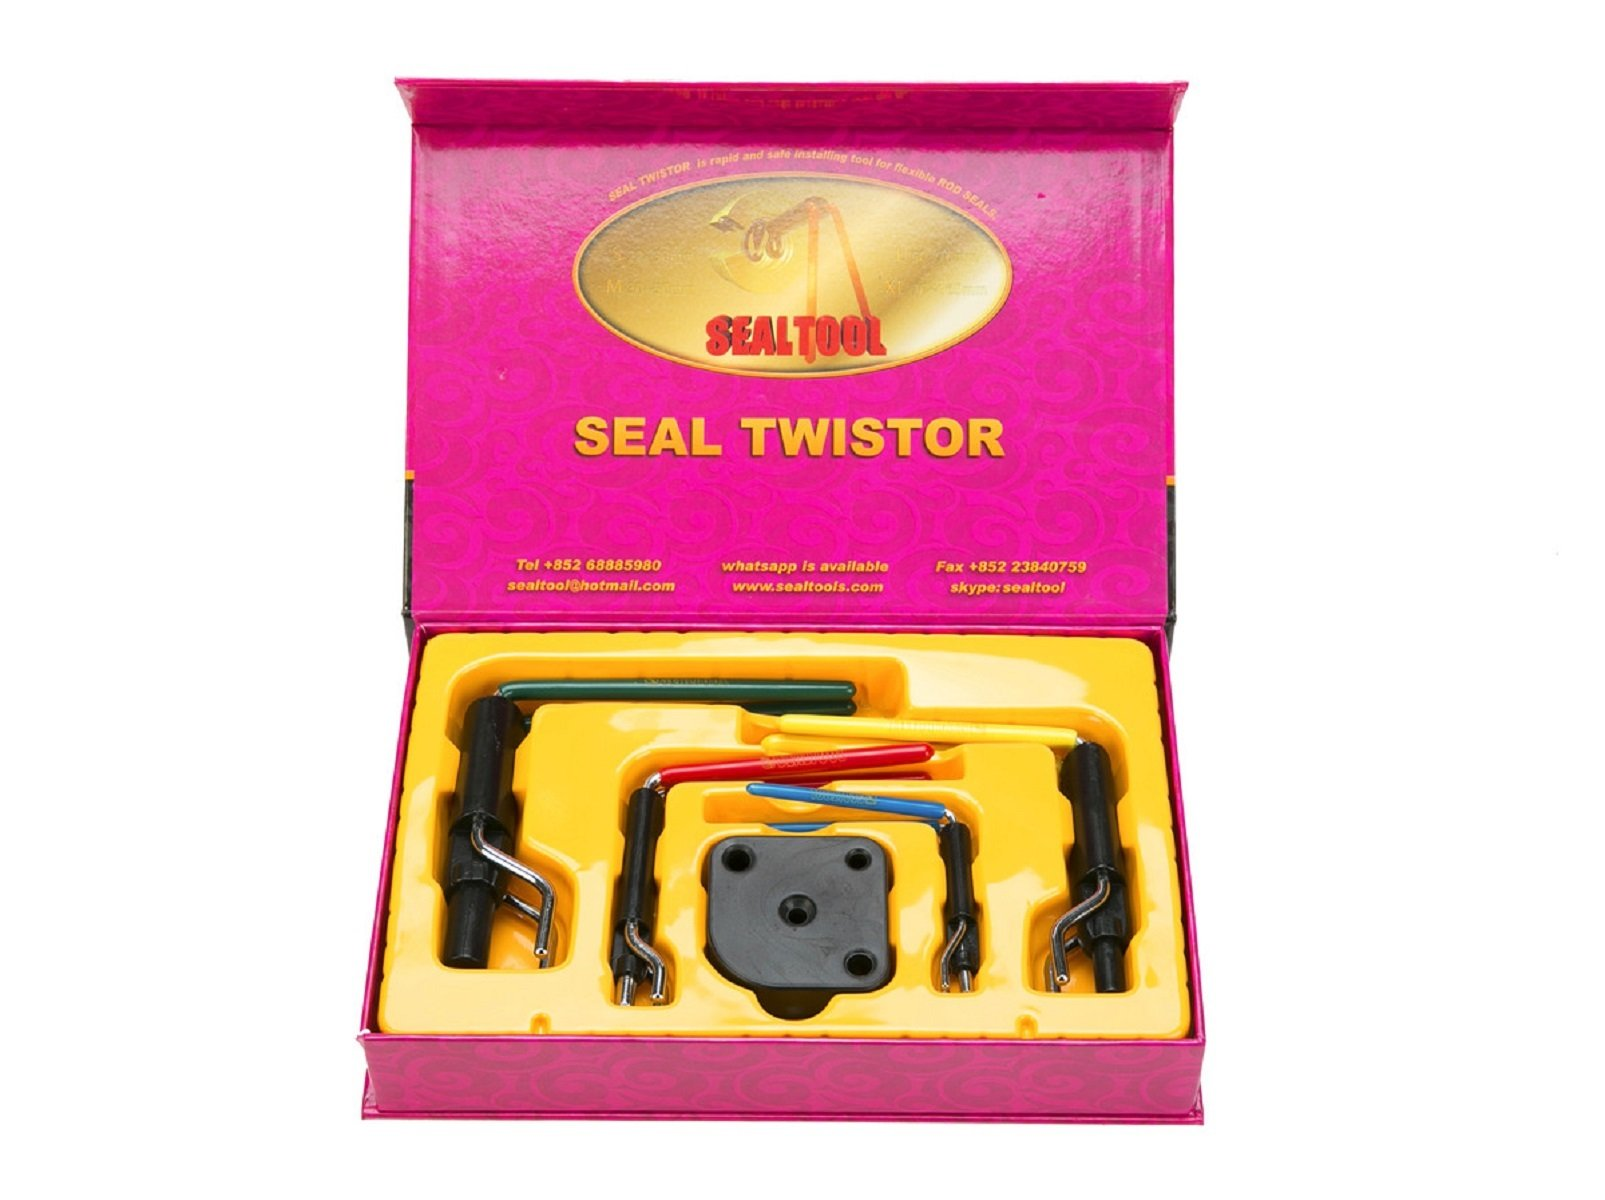 8milelake Hydraulic Cylinder Piston Rod Seal U-cup Installation Tool kit by 8MILELAKE (Image #1)